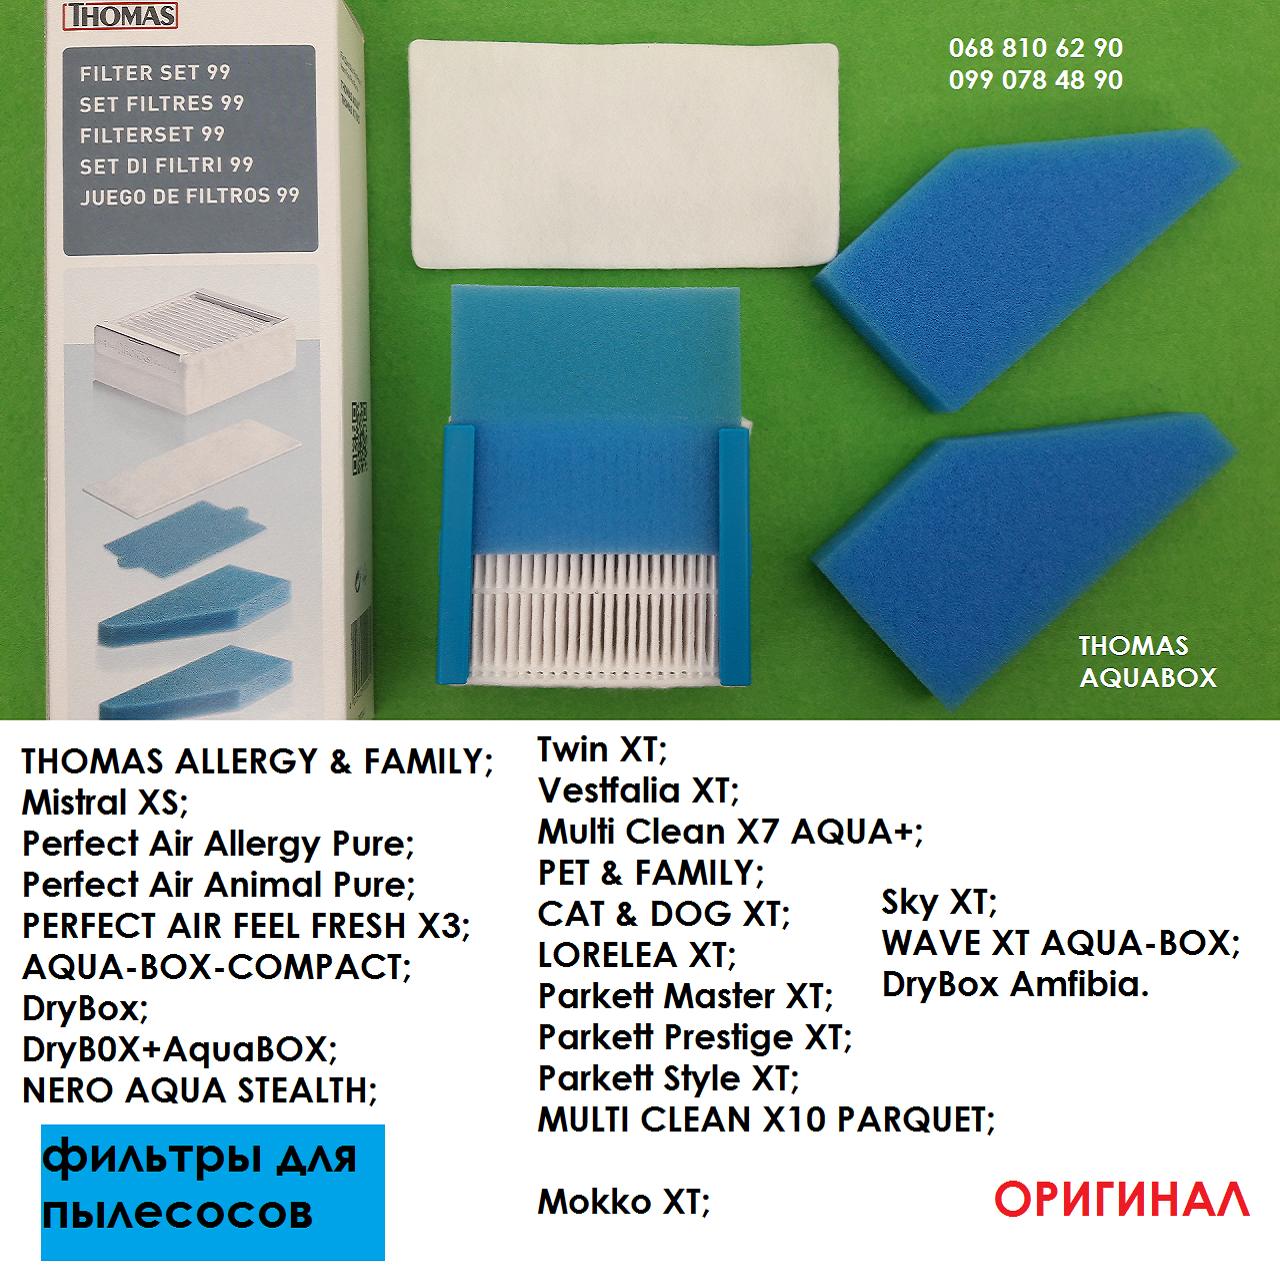 Оригинал Thomas Aquabox Twin XT, Vestfalia XT, Mistral XS, Parkett Master XT фильтры 787241 на моющие пылесосы